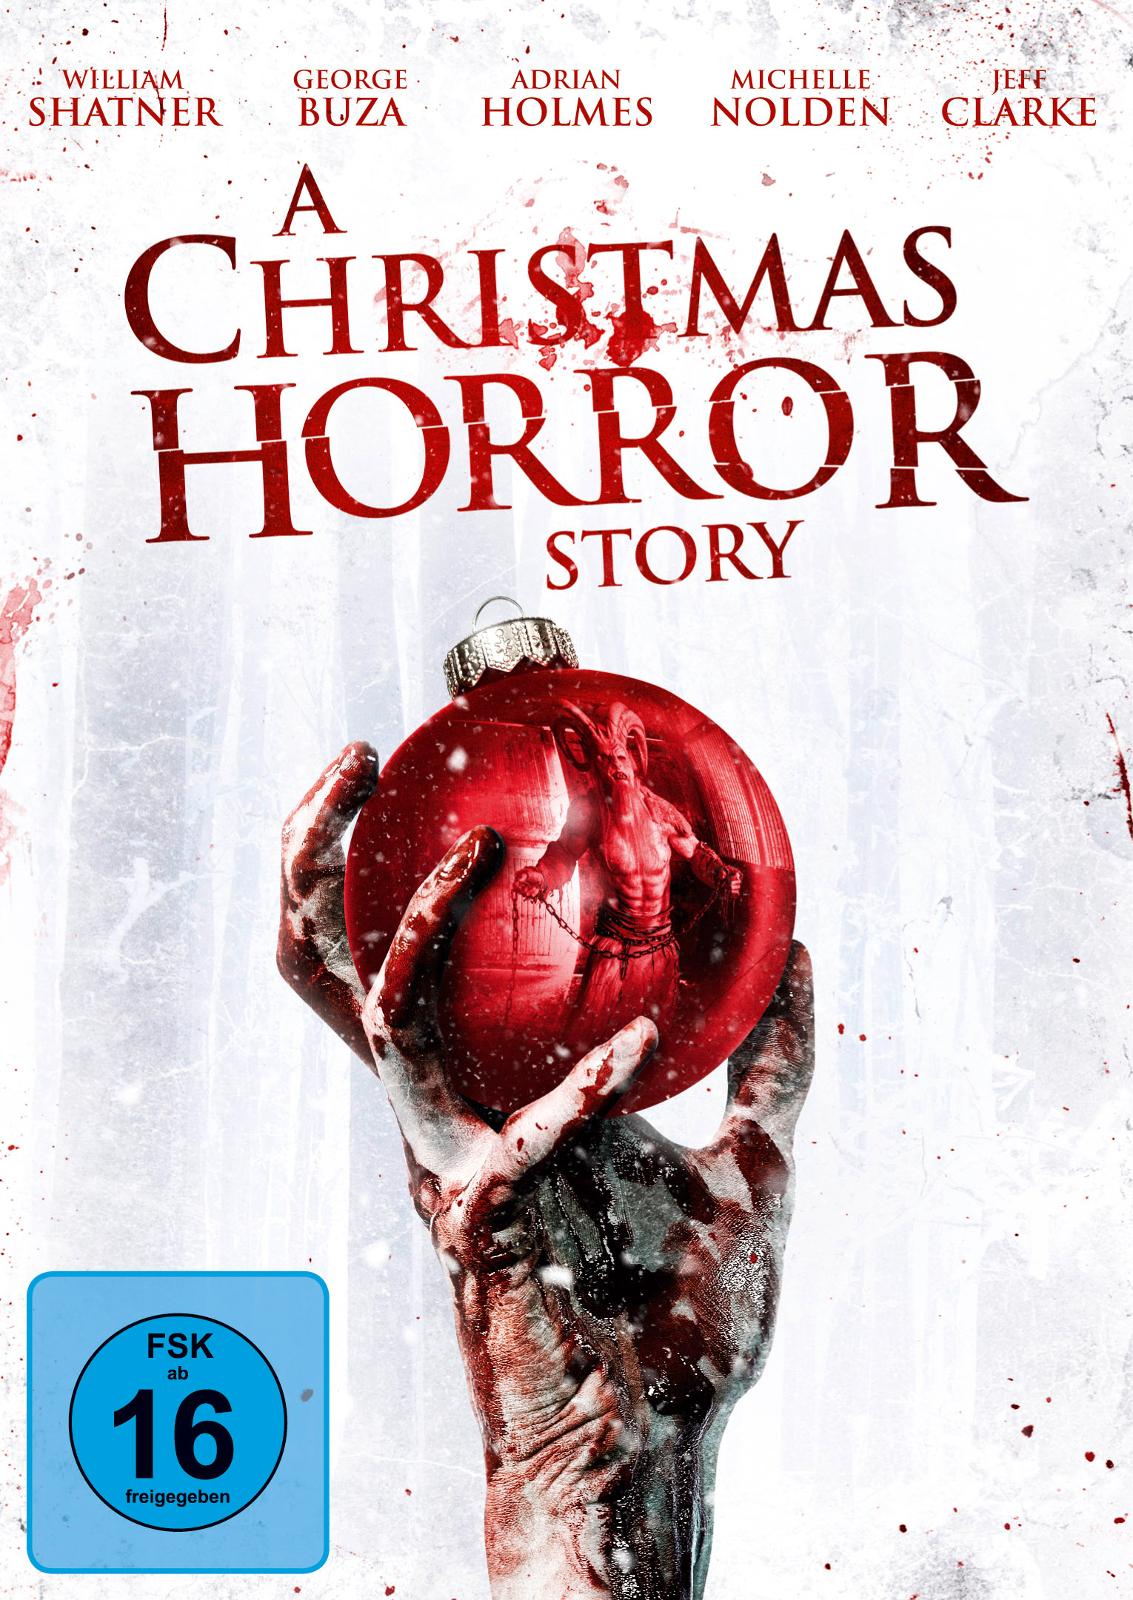 A Christmas Horror Story - Film 2015 - FILMSTARTS.de